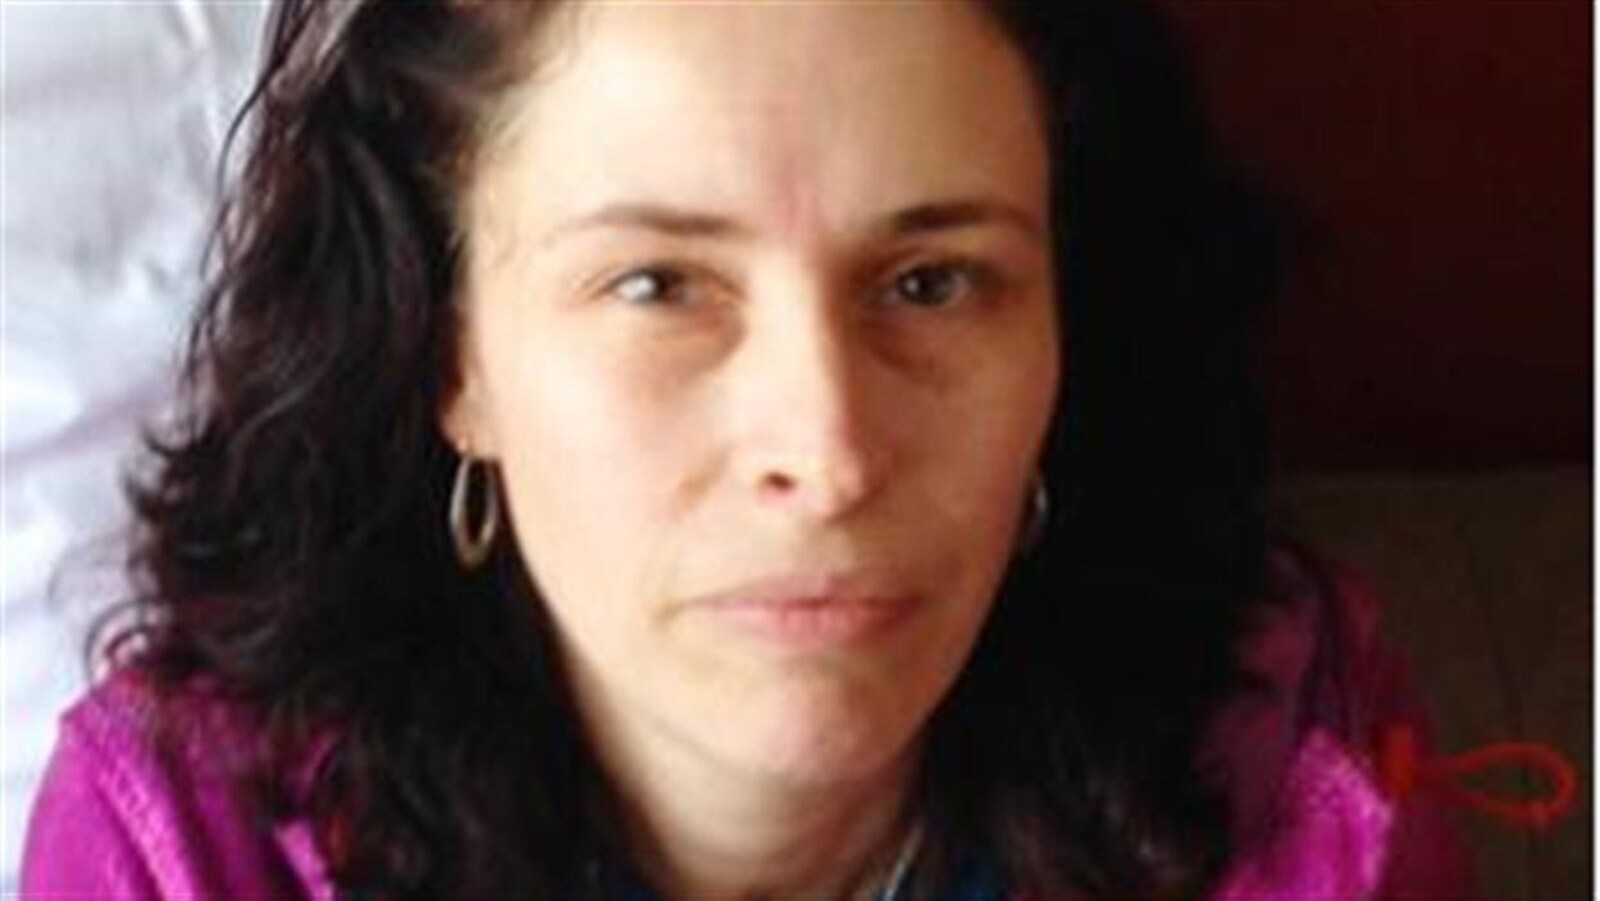 Angela DiStasio